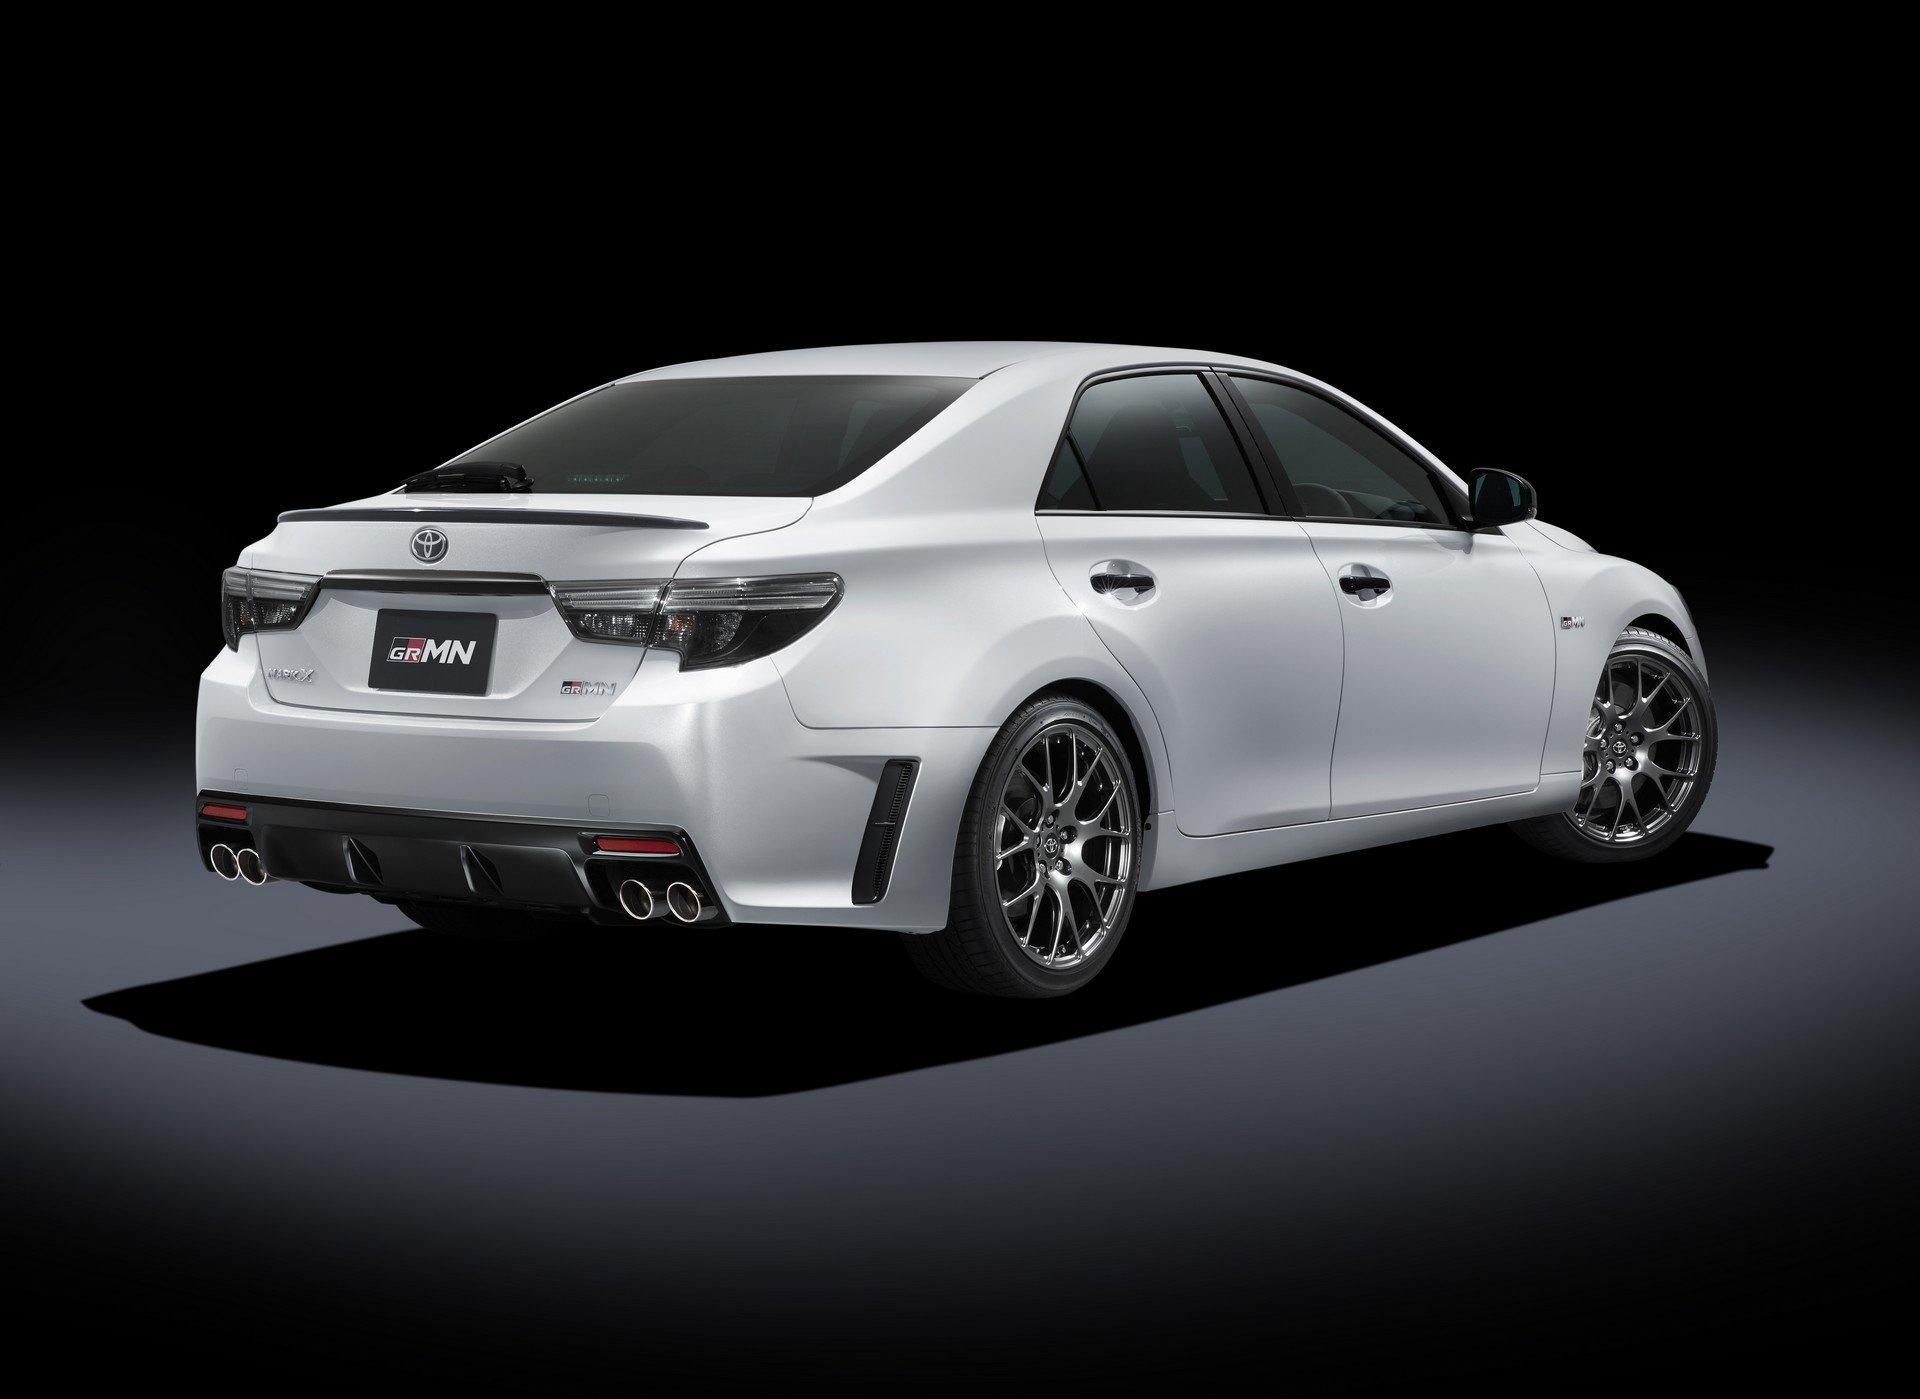 Noua masina de la Toyota e nebunie curata: Are motor aspirat de 313 cai, cutie manuala si tractiune spate